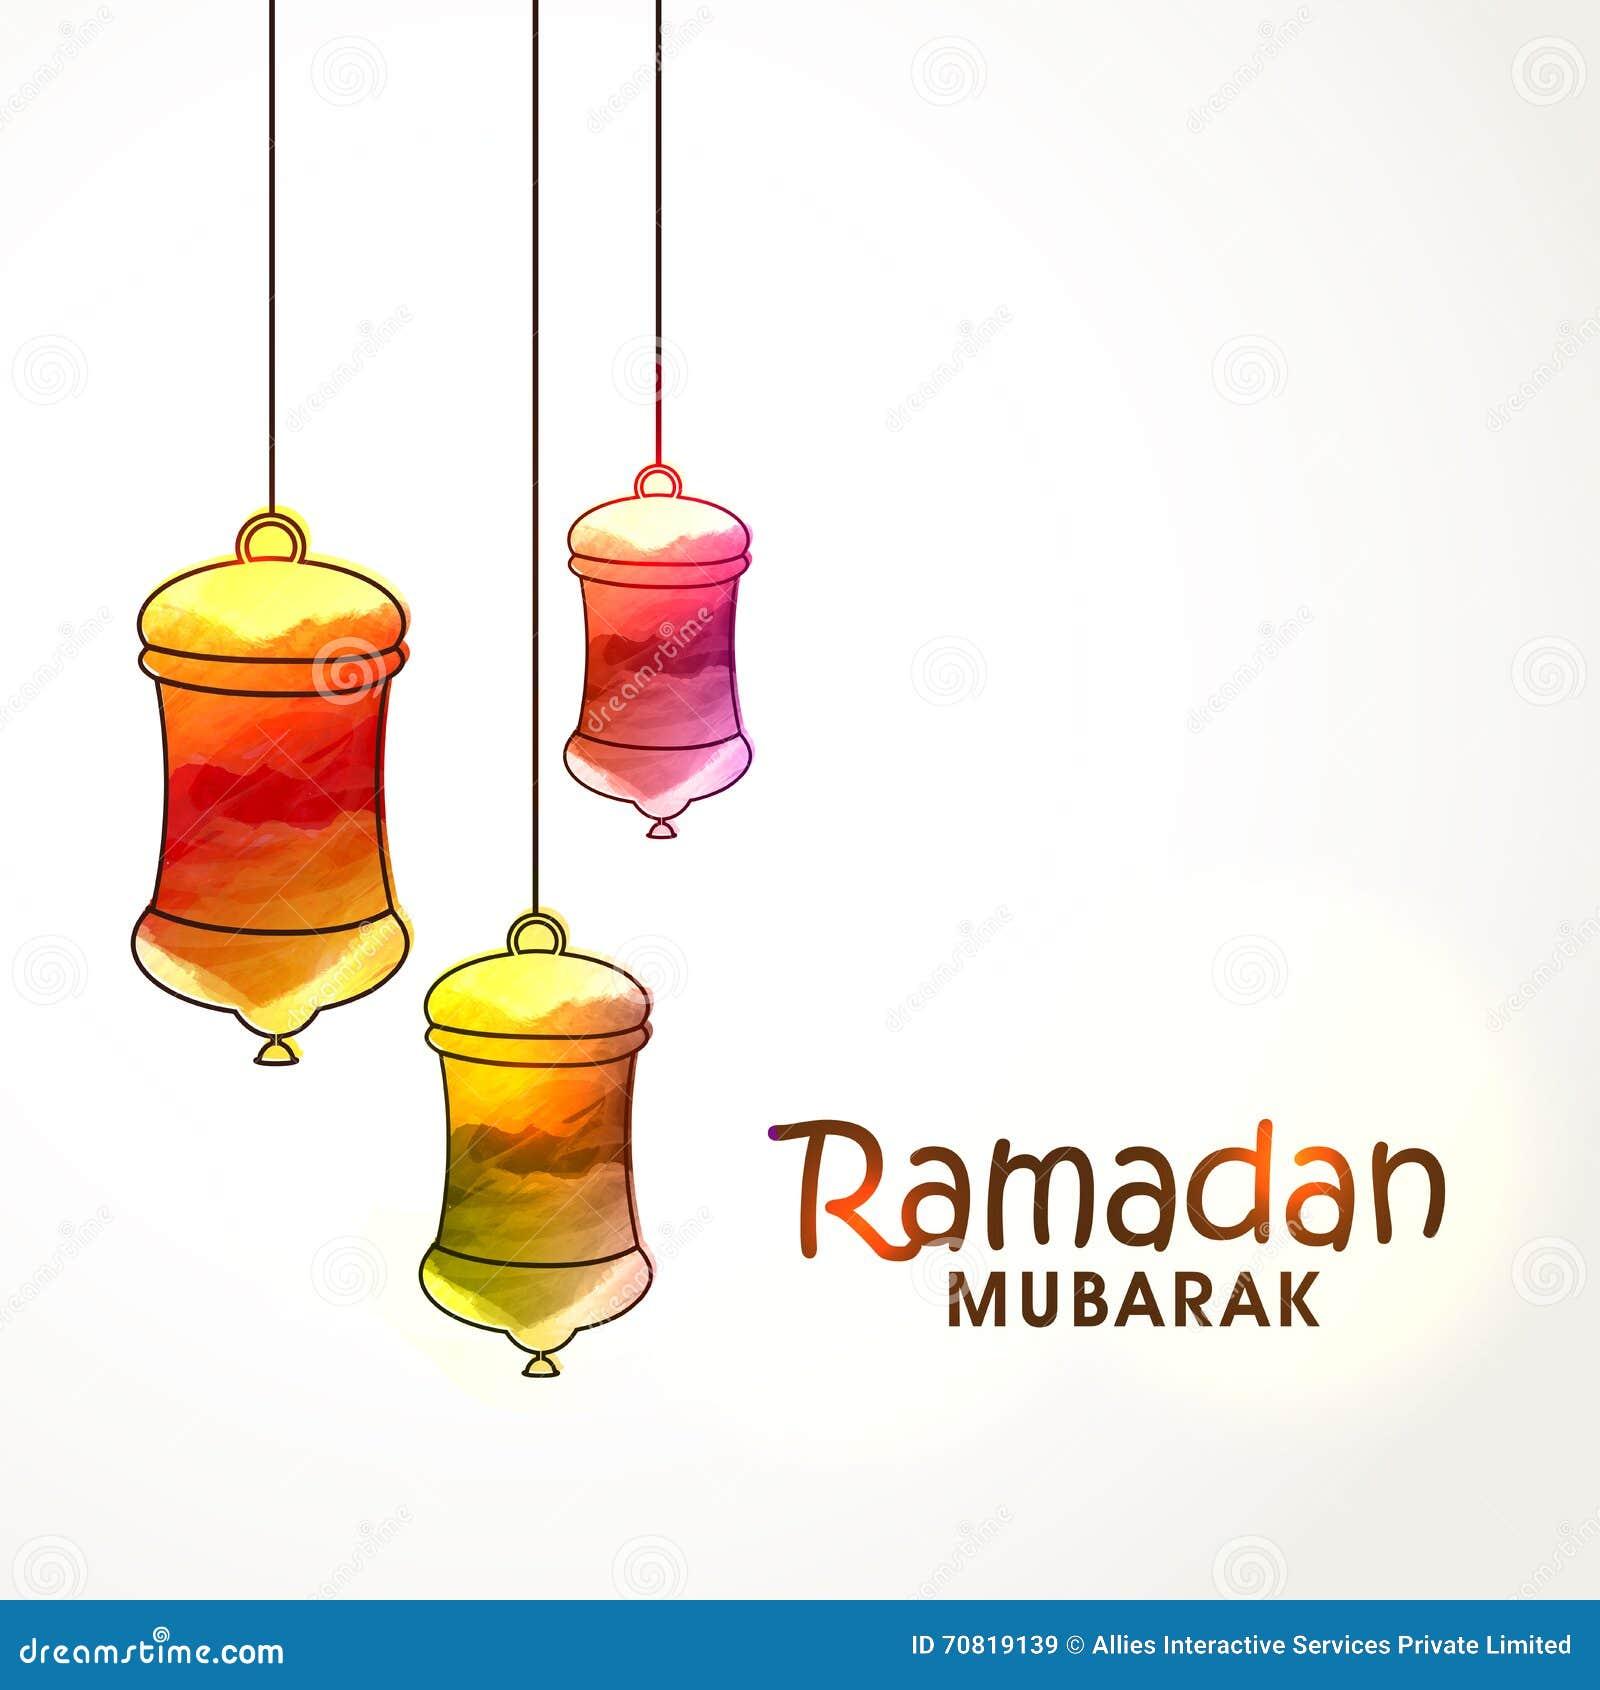 Ramadan Mubarak Greeting CardShiny Decorated Crescent